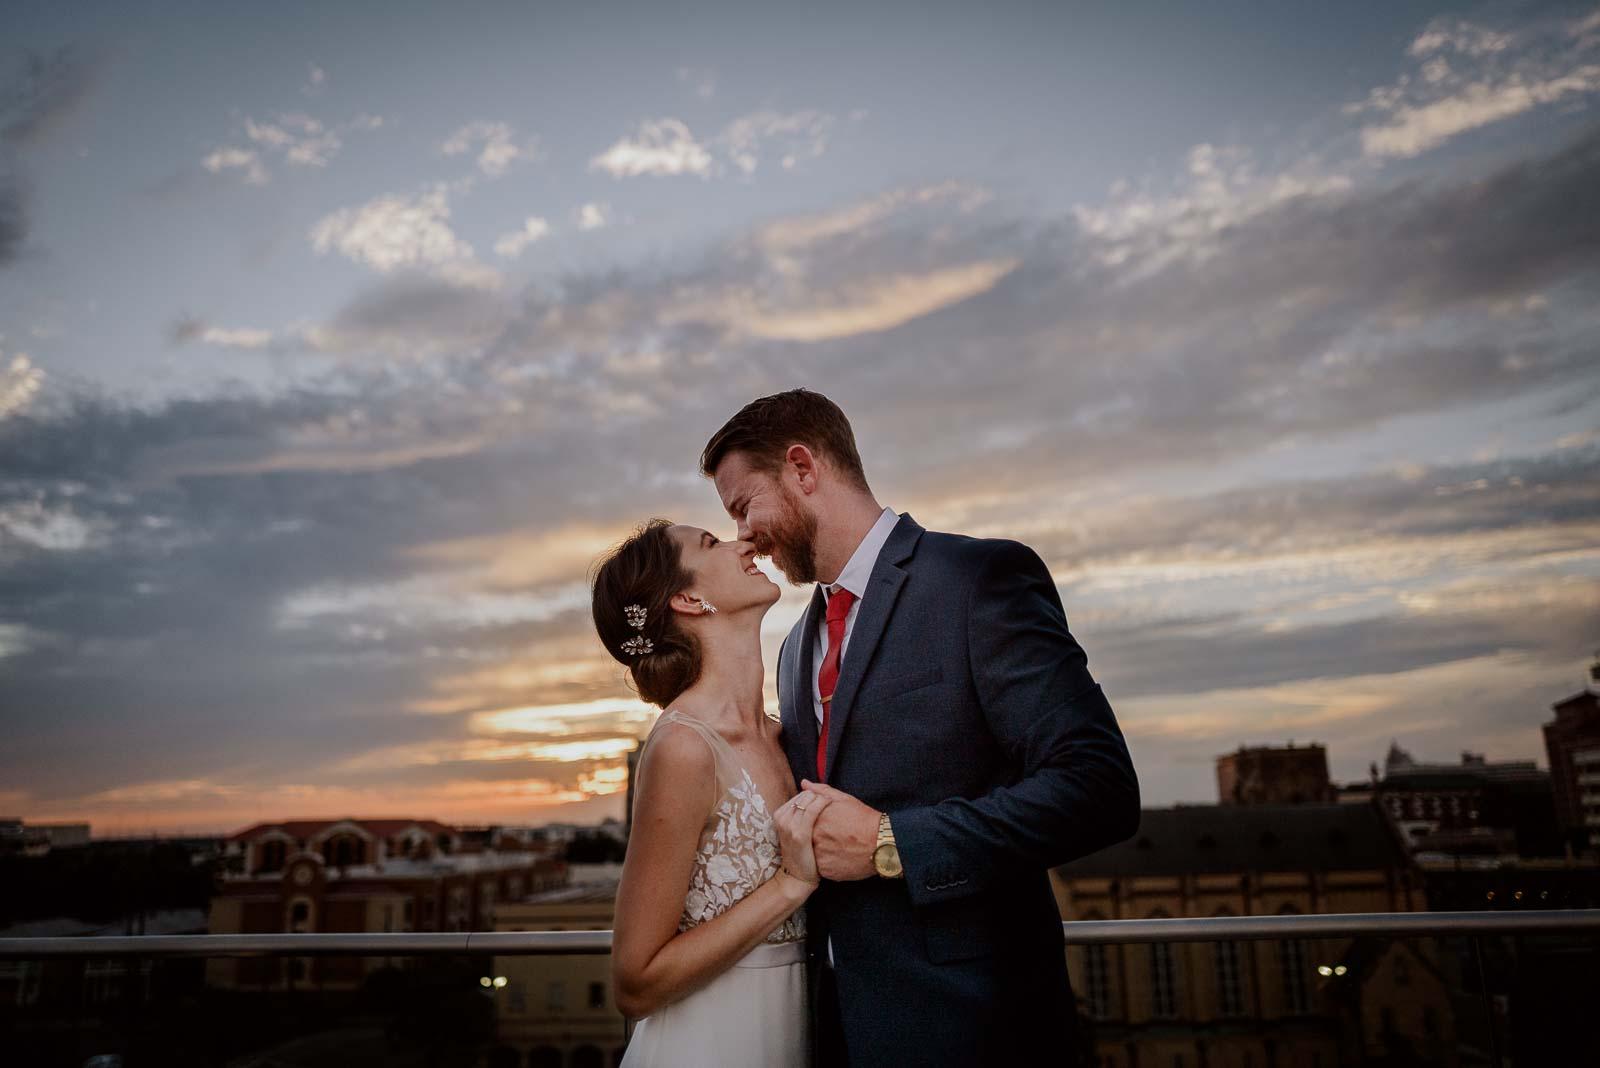 032 The Fairmount Hotel Rooftop Oyster Bar Wedding Reception Leica photographer Philip Thomas Photography